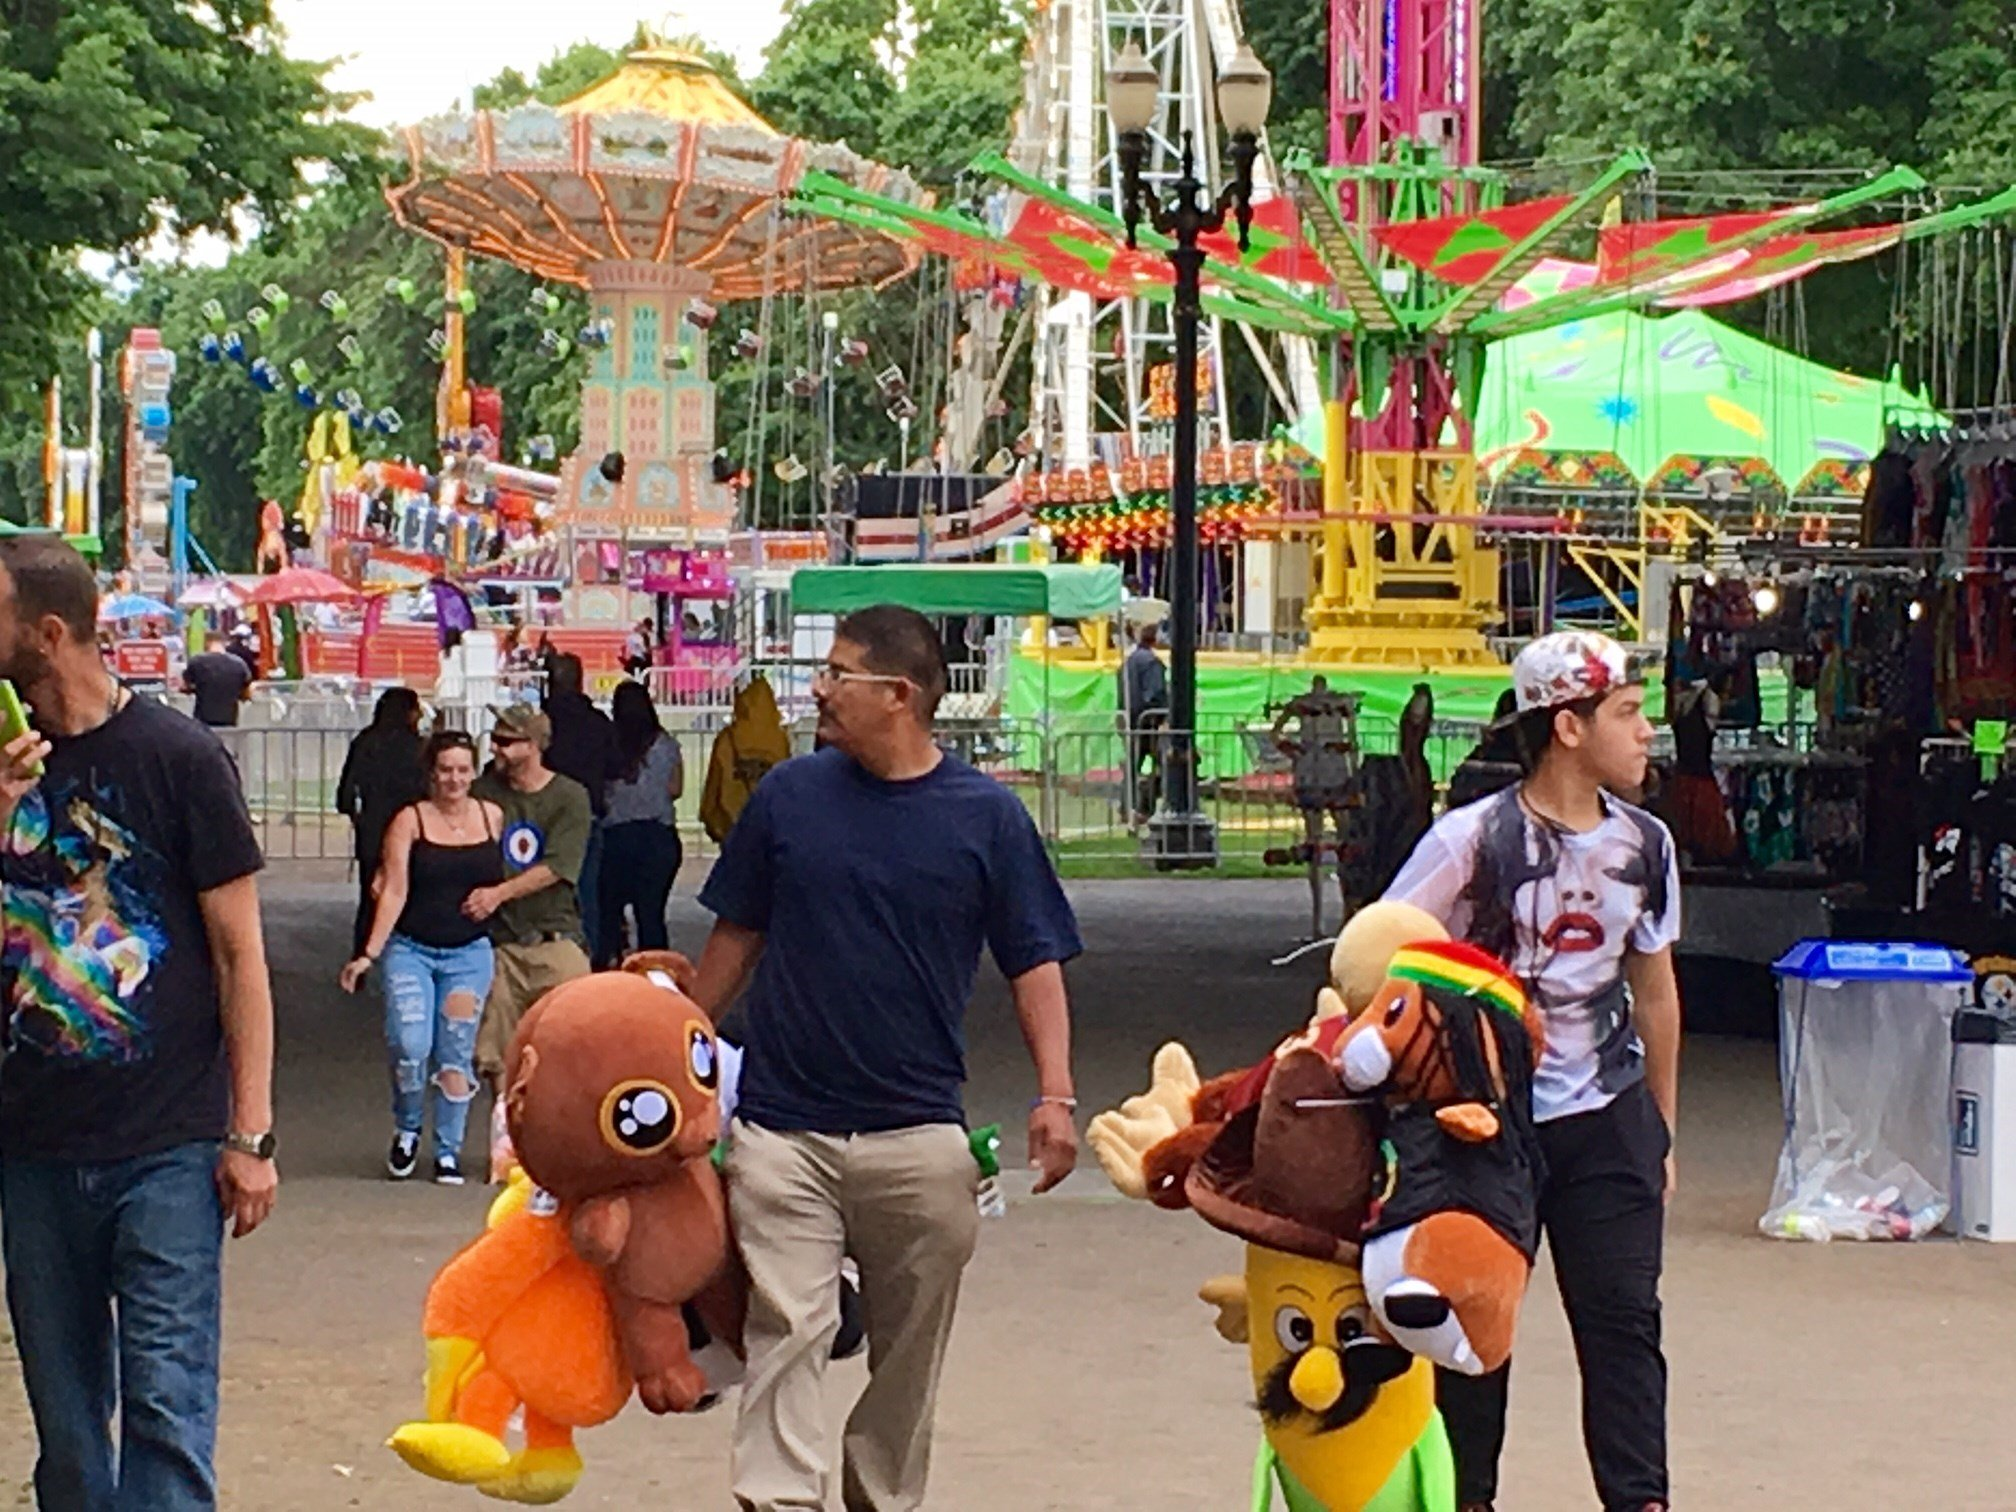 People enjoying City Fair in Portland Thursday. (KPTV)